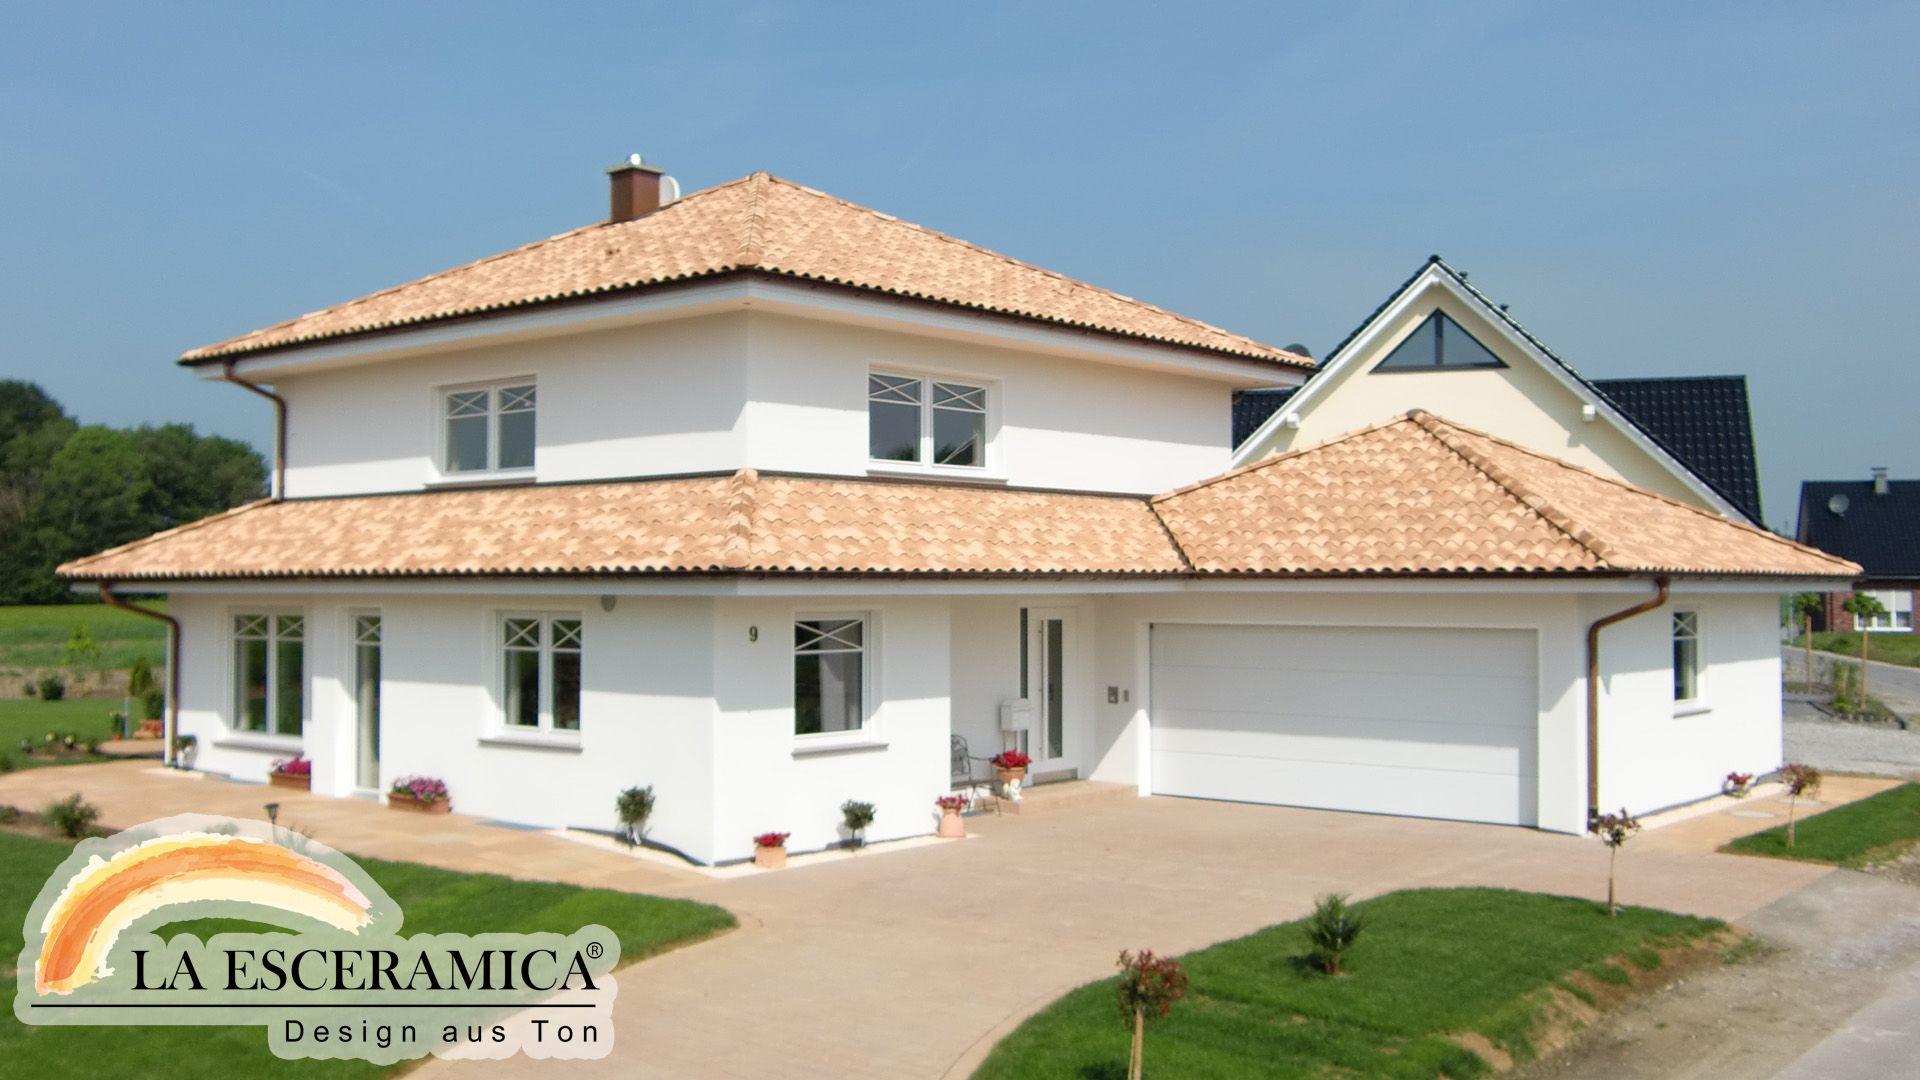 la esceramica dachziegel farbe sahara dachziegel pinterest dachziegel farben und aussen. Black Bedroom Furniture Sets. Home Design Ideas